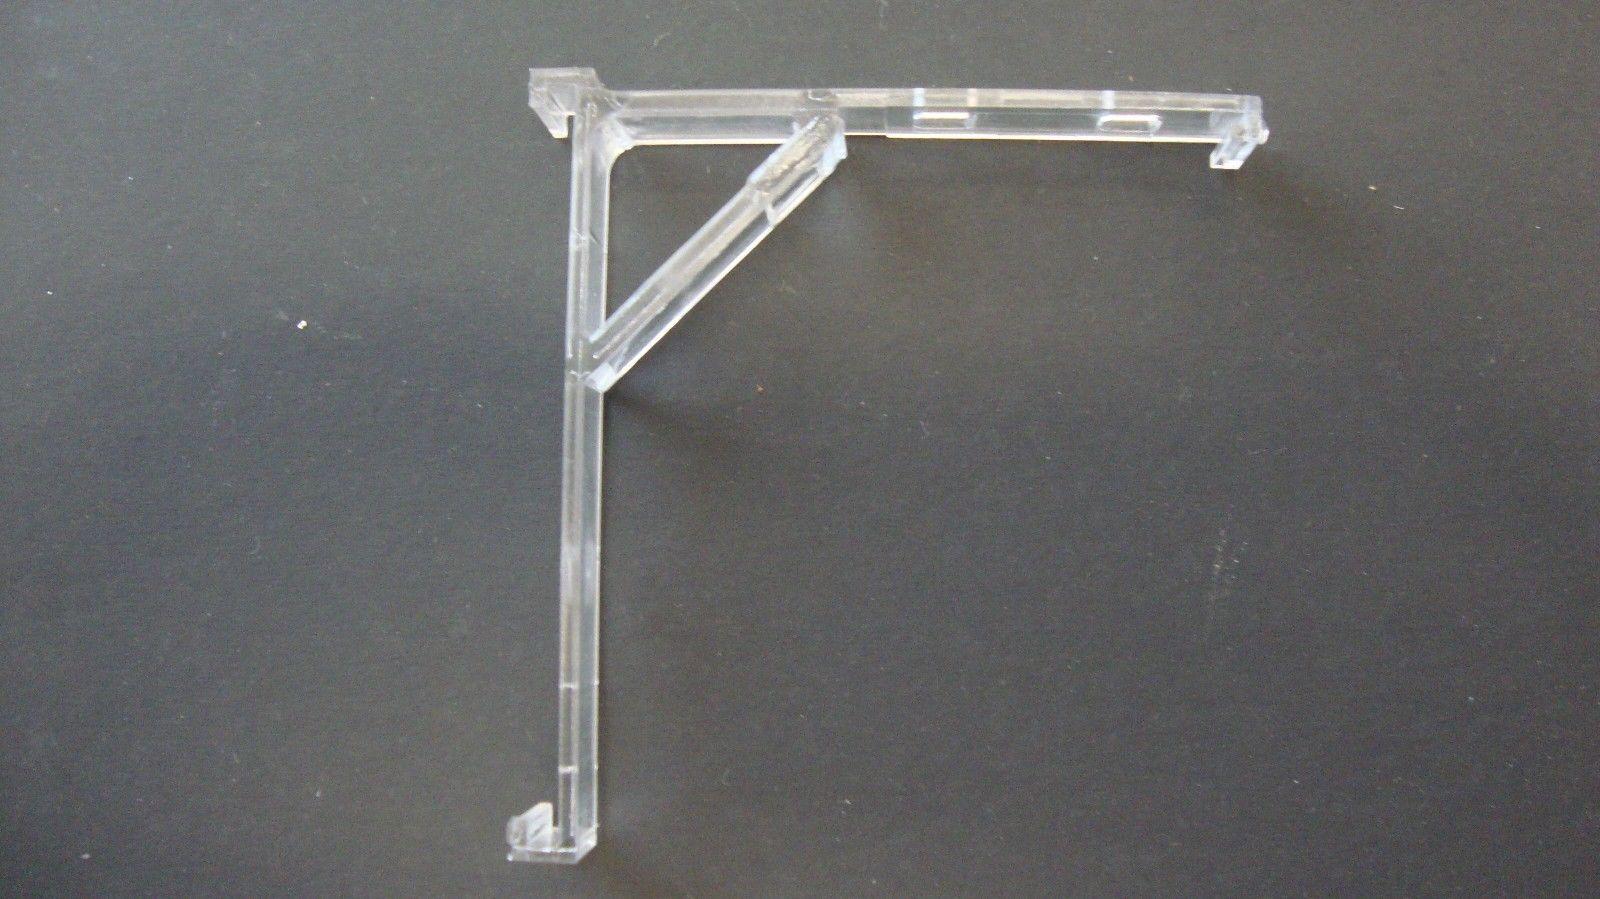 Bali Vertical Blind Parts Bali Graber Vertical G85 Wand